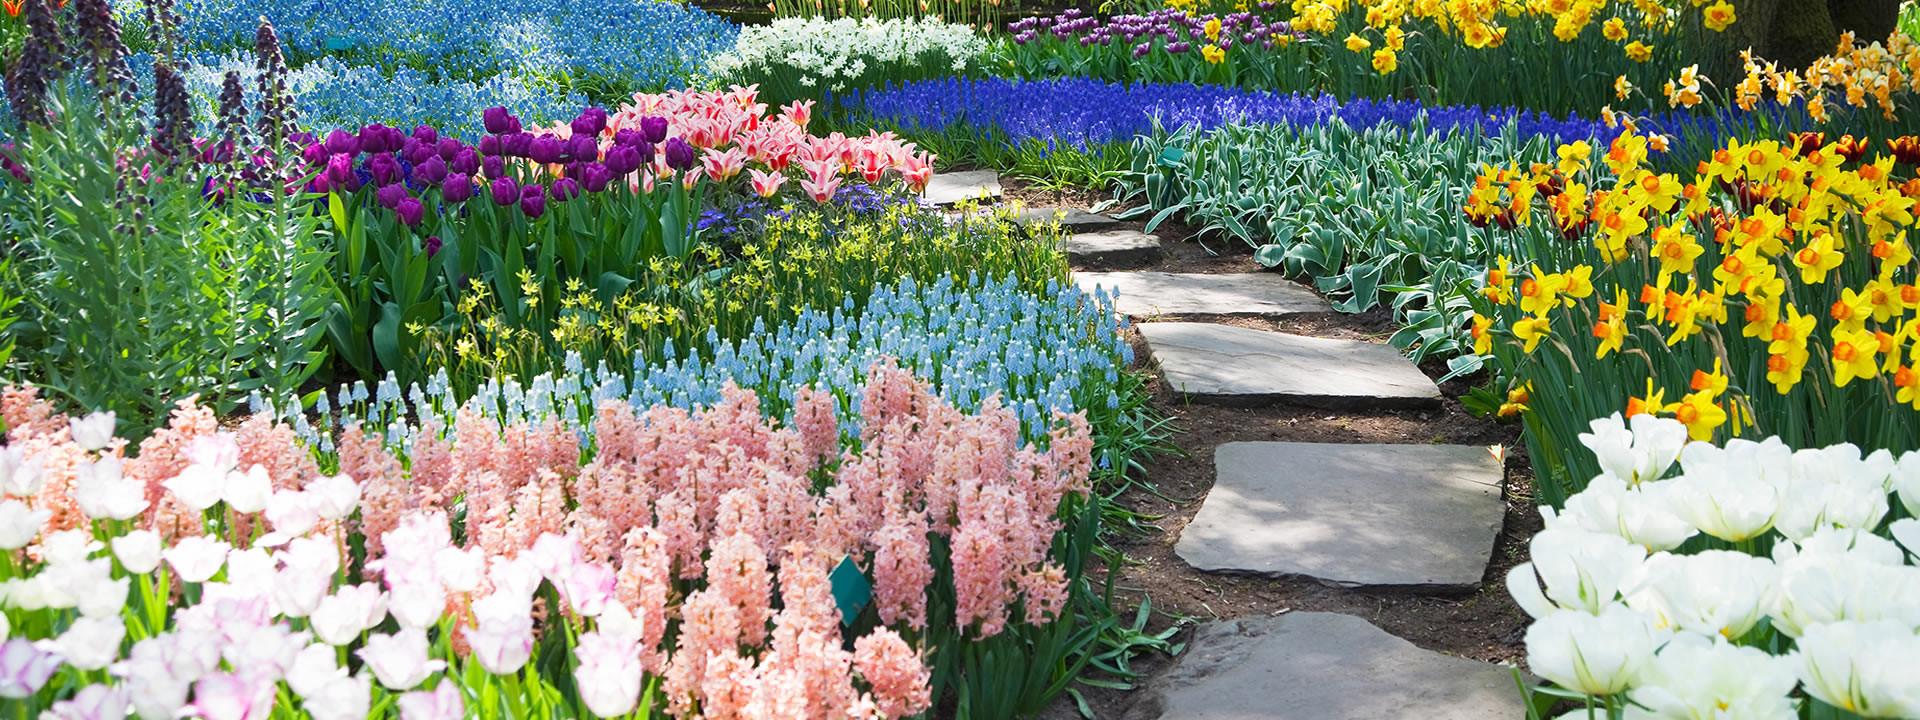 Grief & Healing | Emerald Hills Funeral Home & Memorial Park